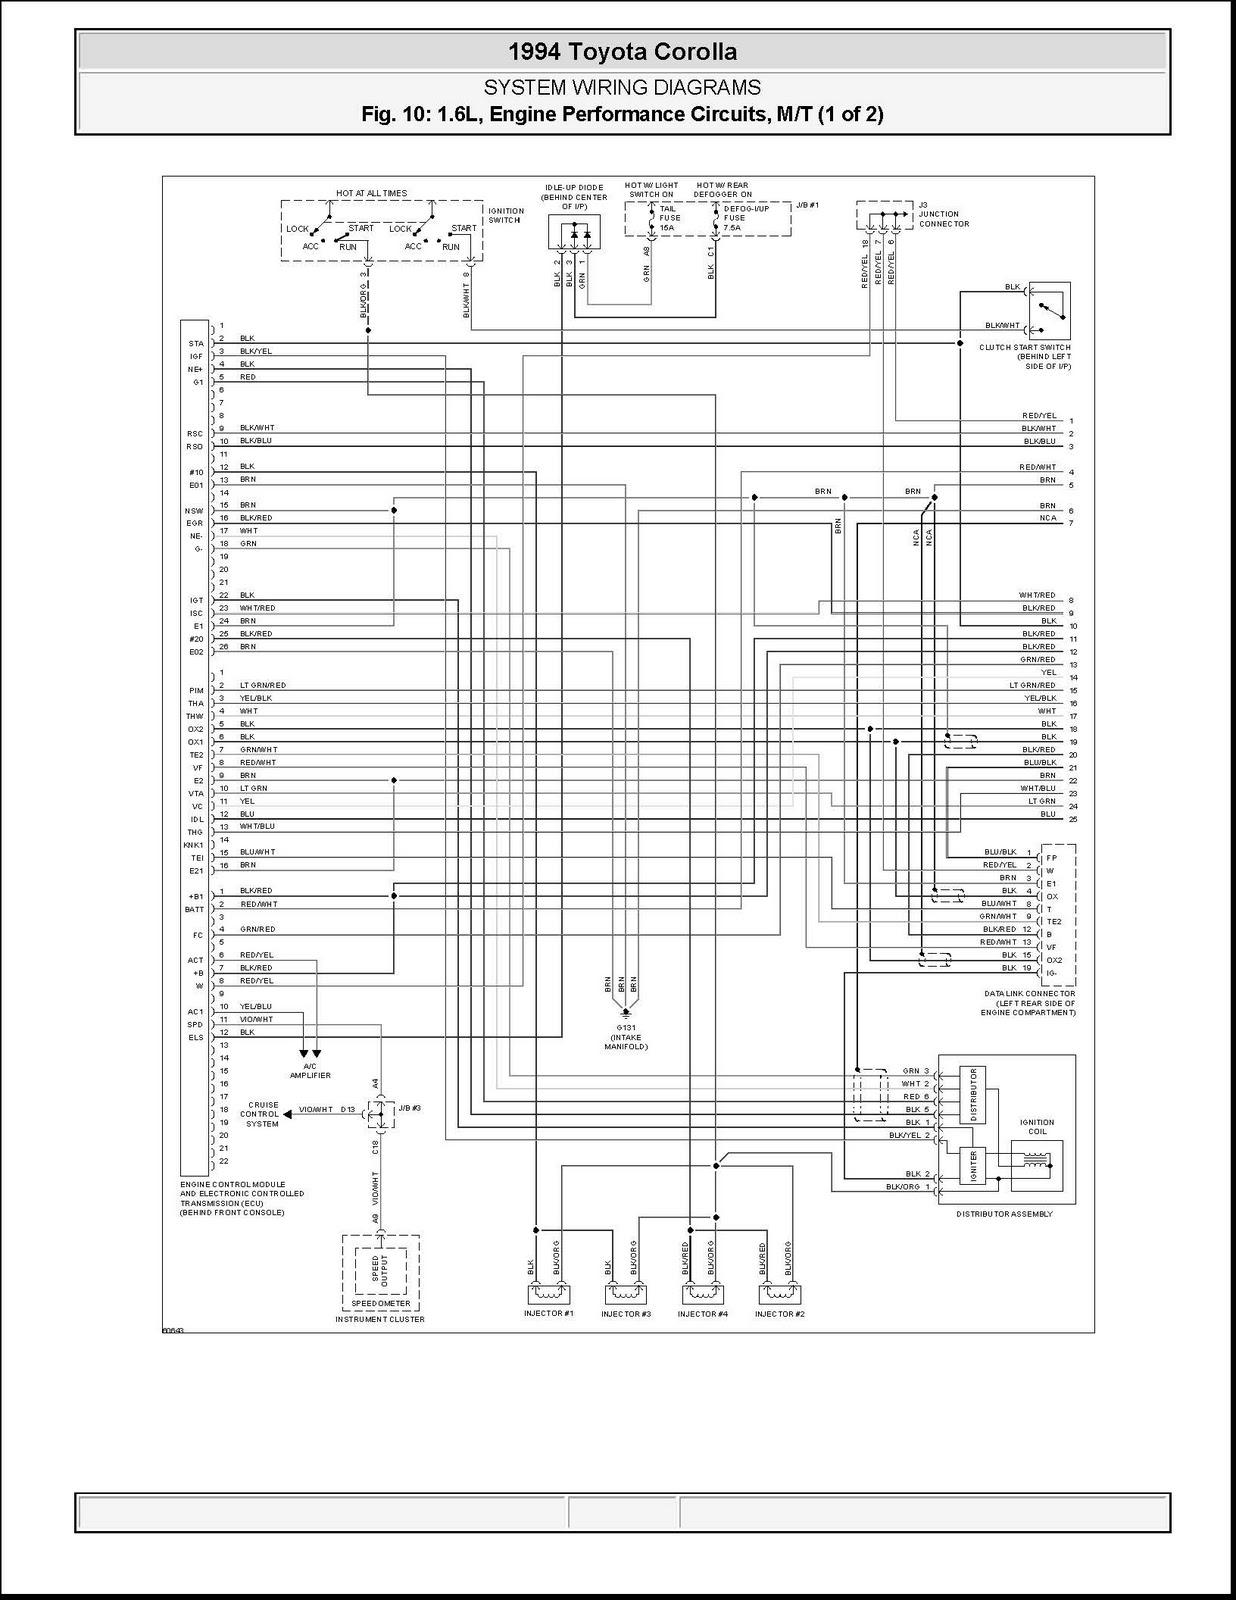 1994 ford escolta aire acondicionado diagrama